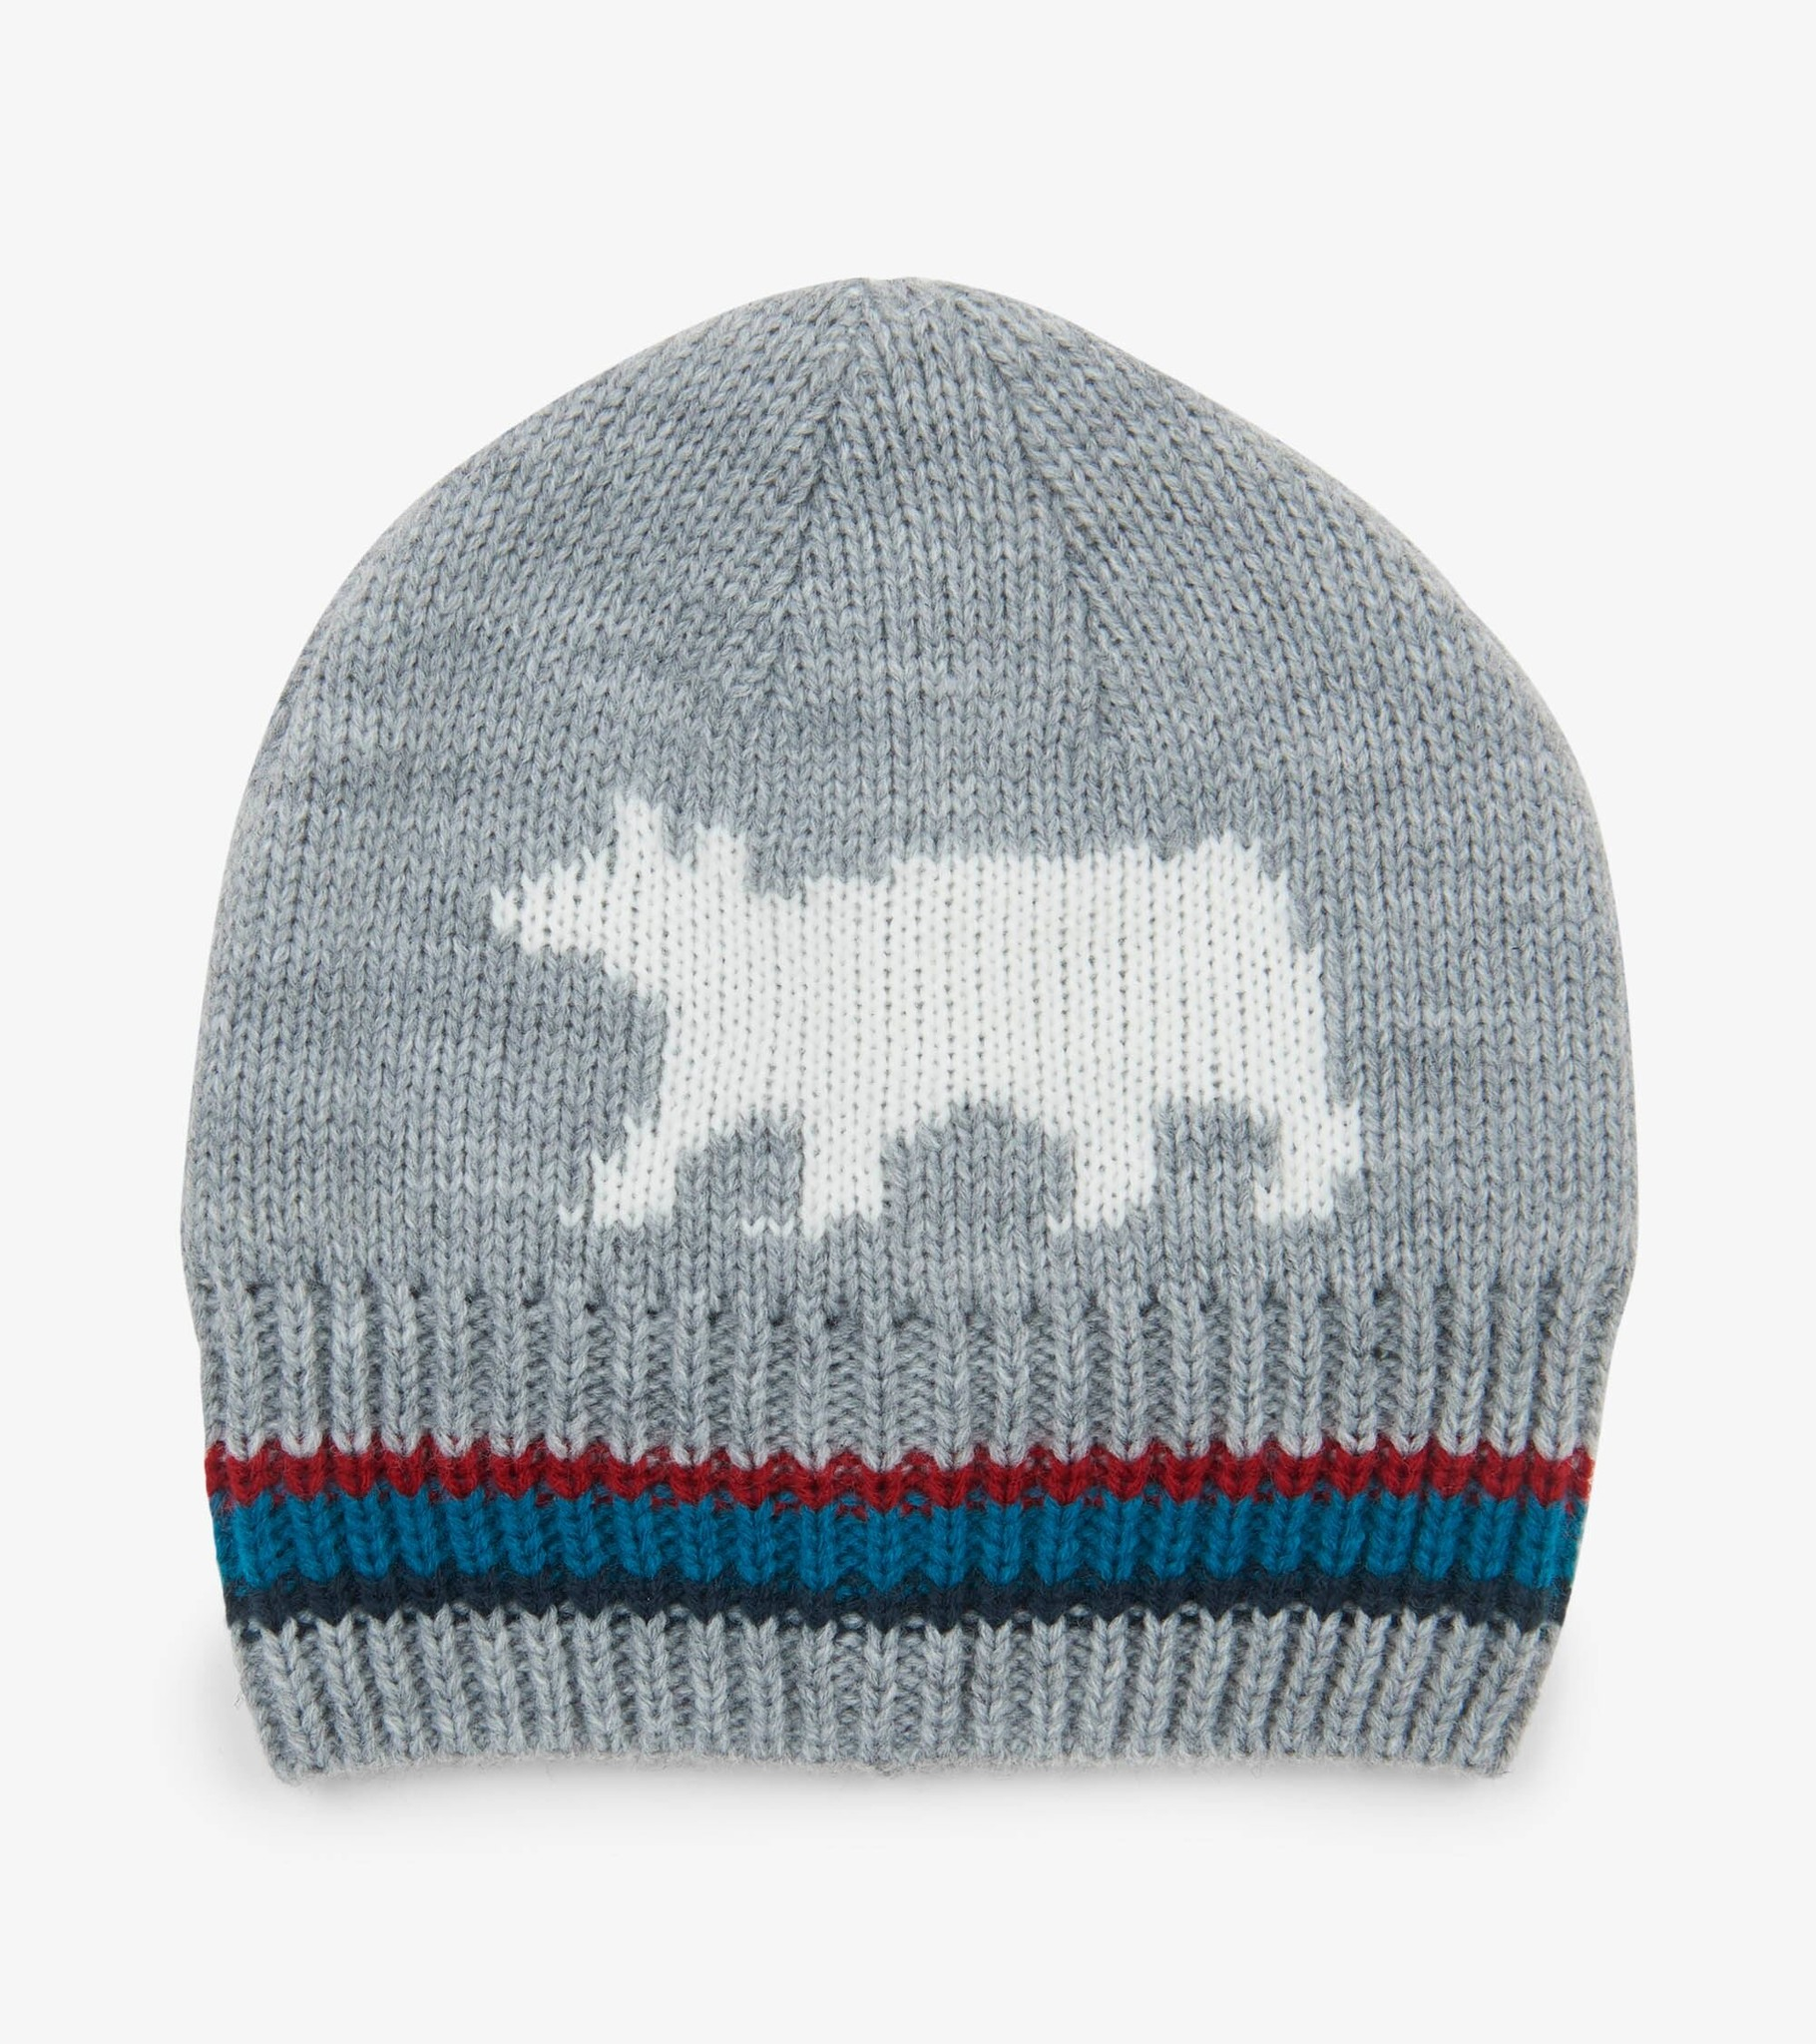 Hatley Hatley Polar Bear Winter Hat